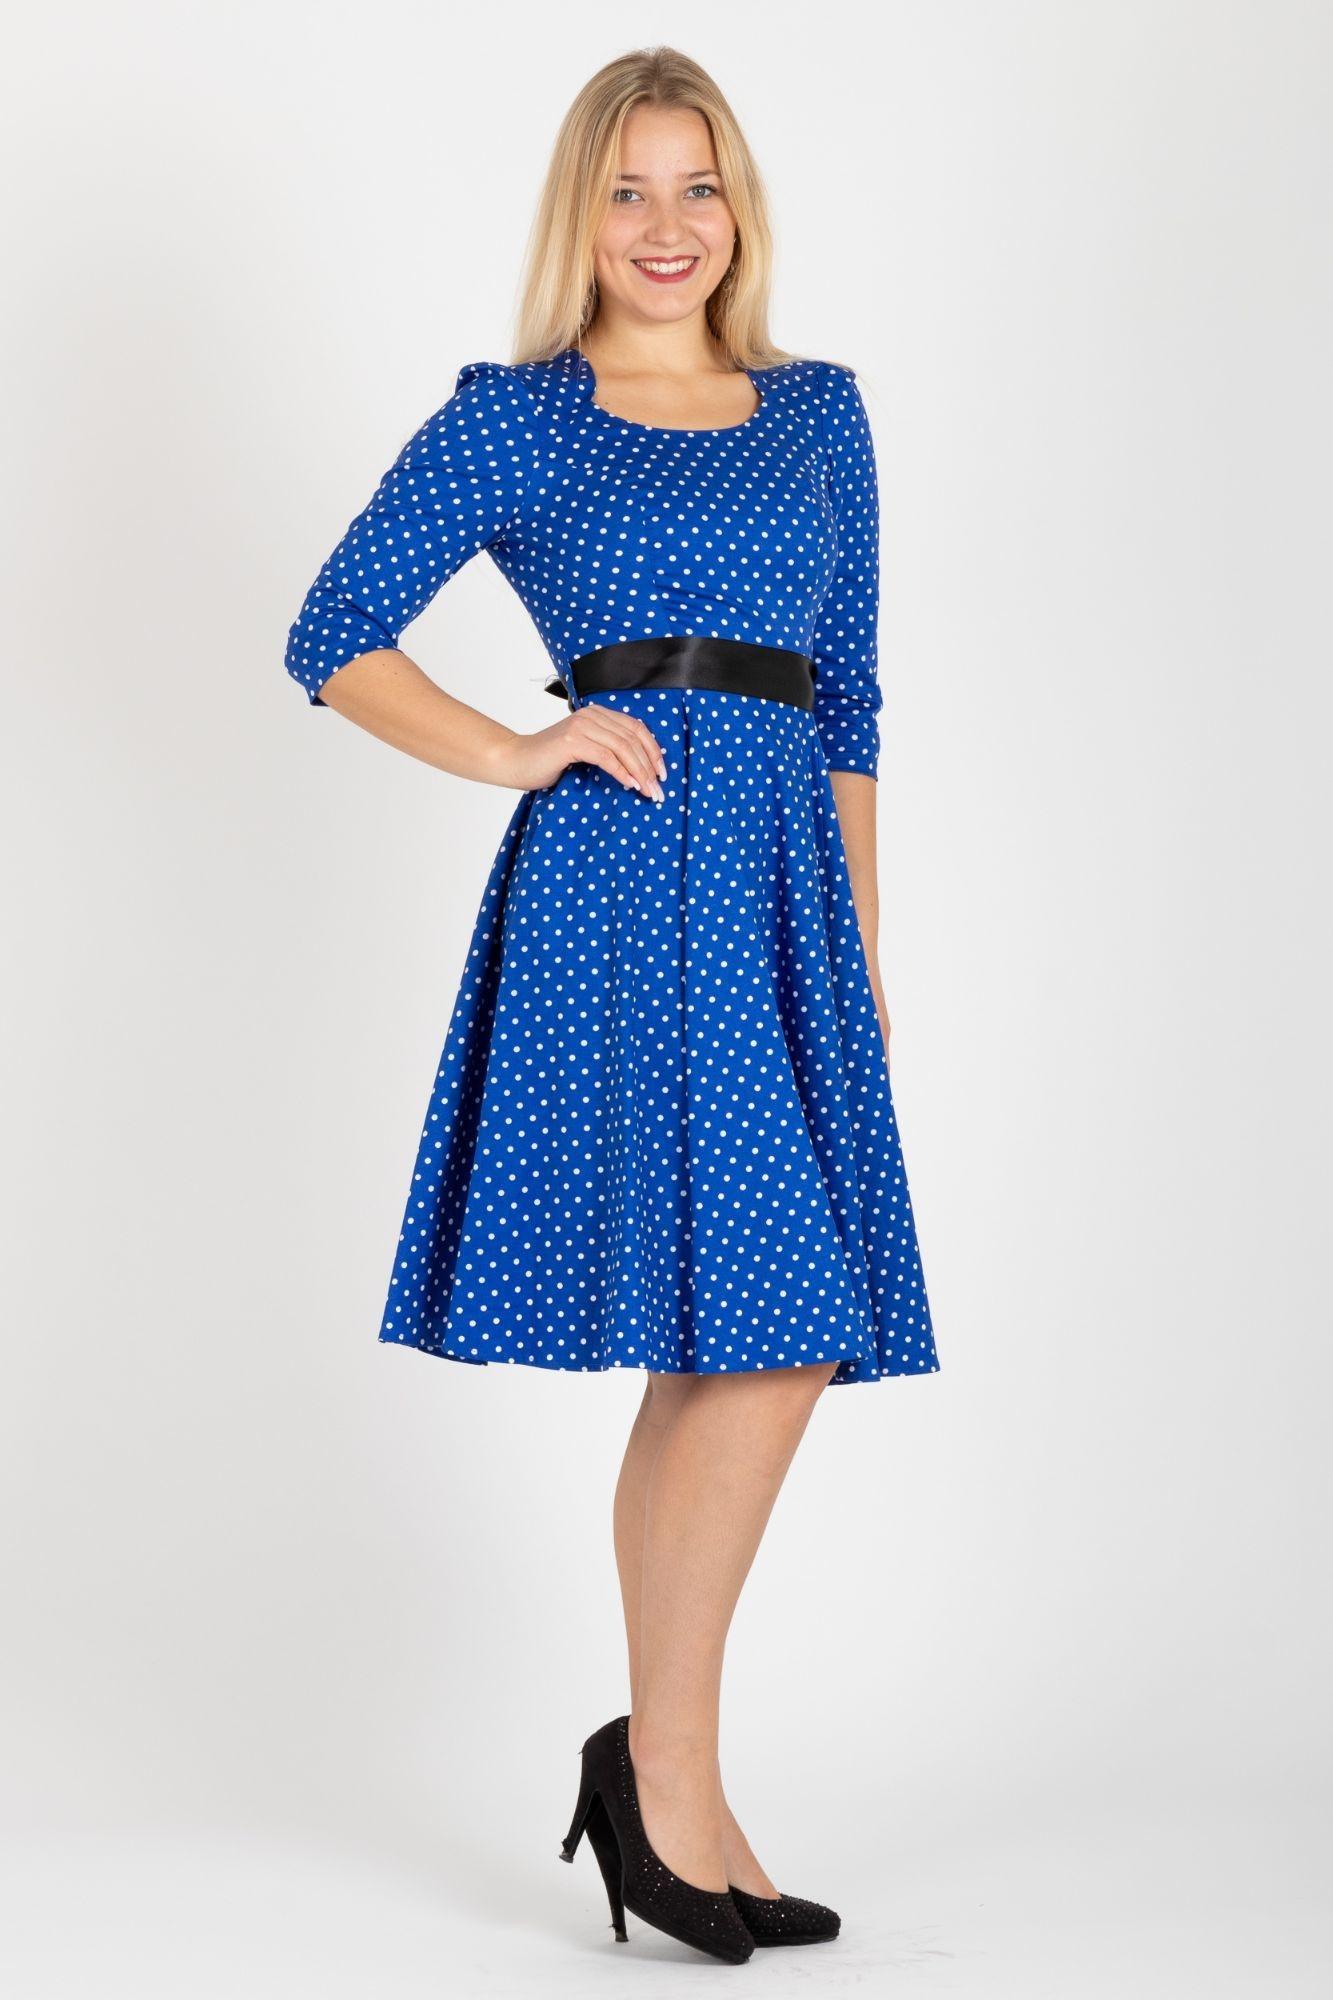 ee6539fab323 ... modré Retro šaty s puntíky Adele